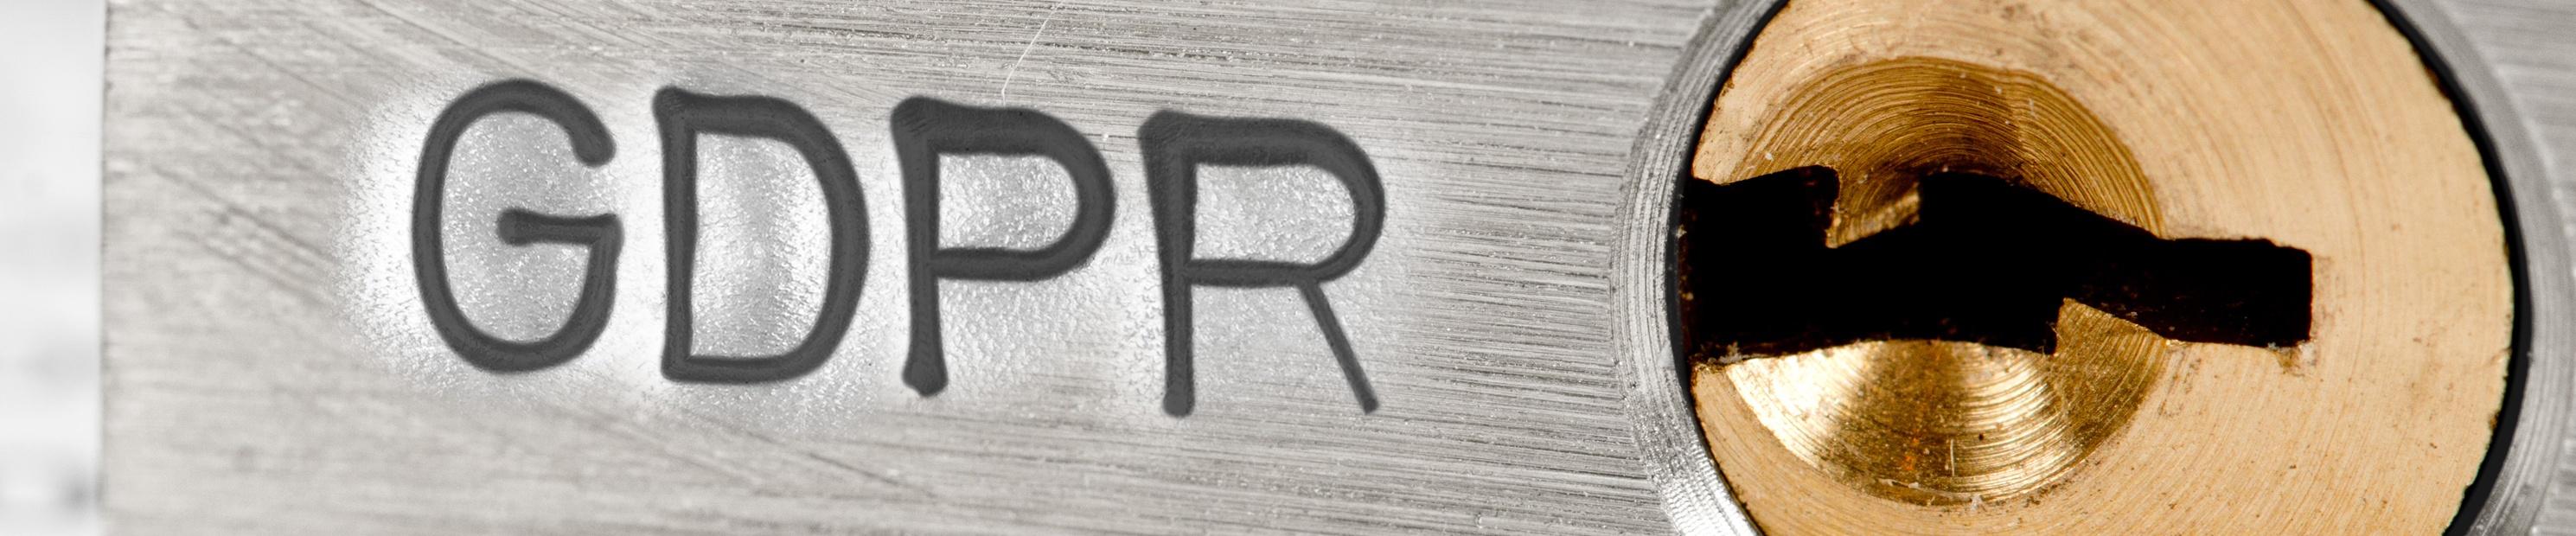 GDPR_Banner.jpg